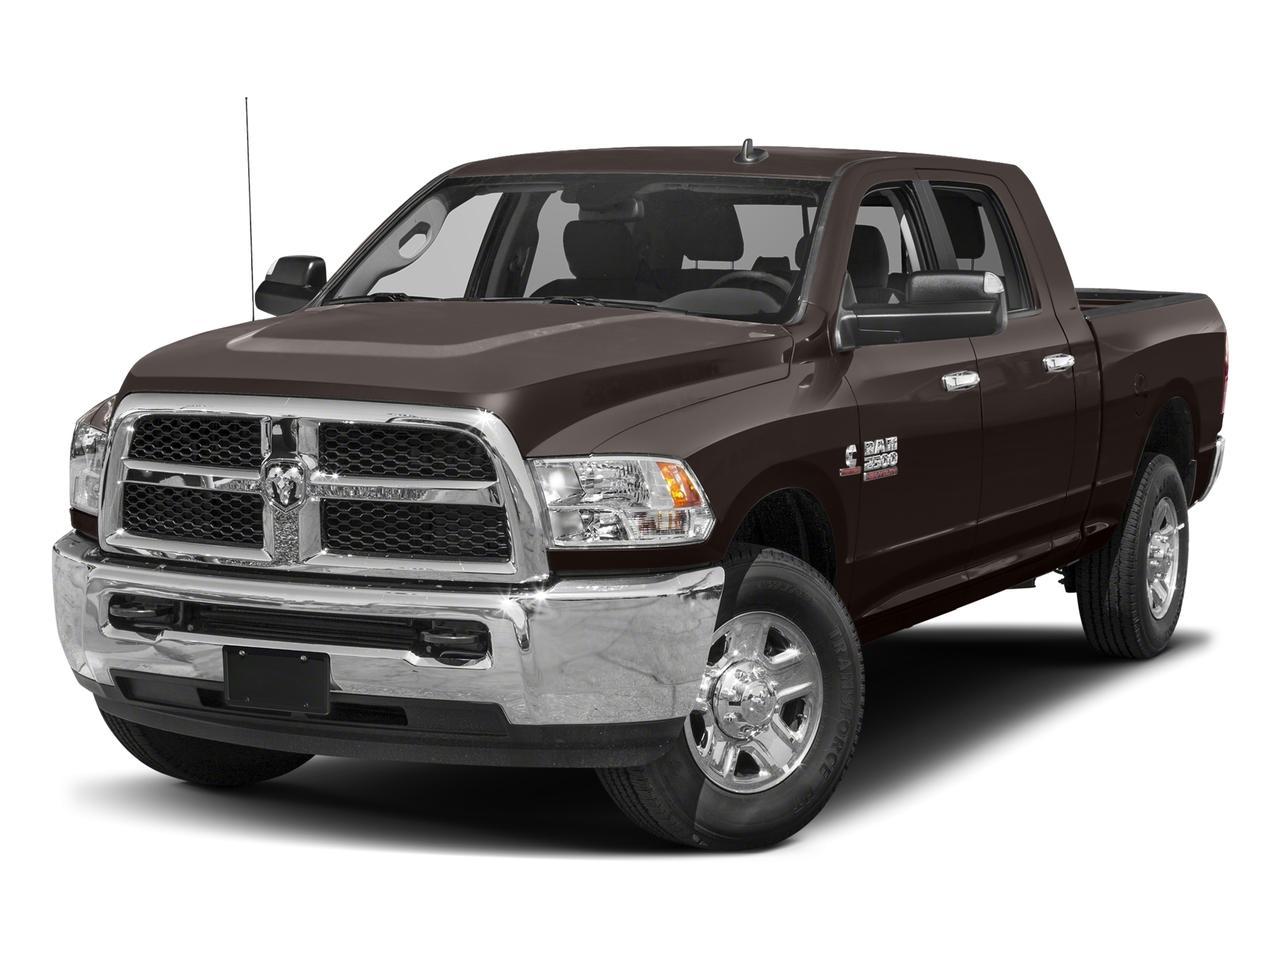 2016 Ram 2500 Vehicle Photo in Corpus Christi, TX 78411